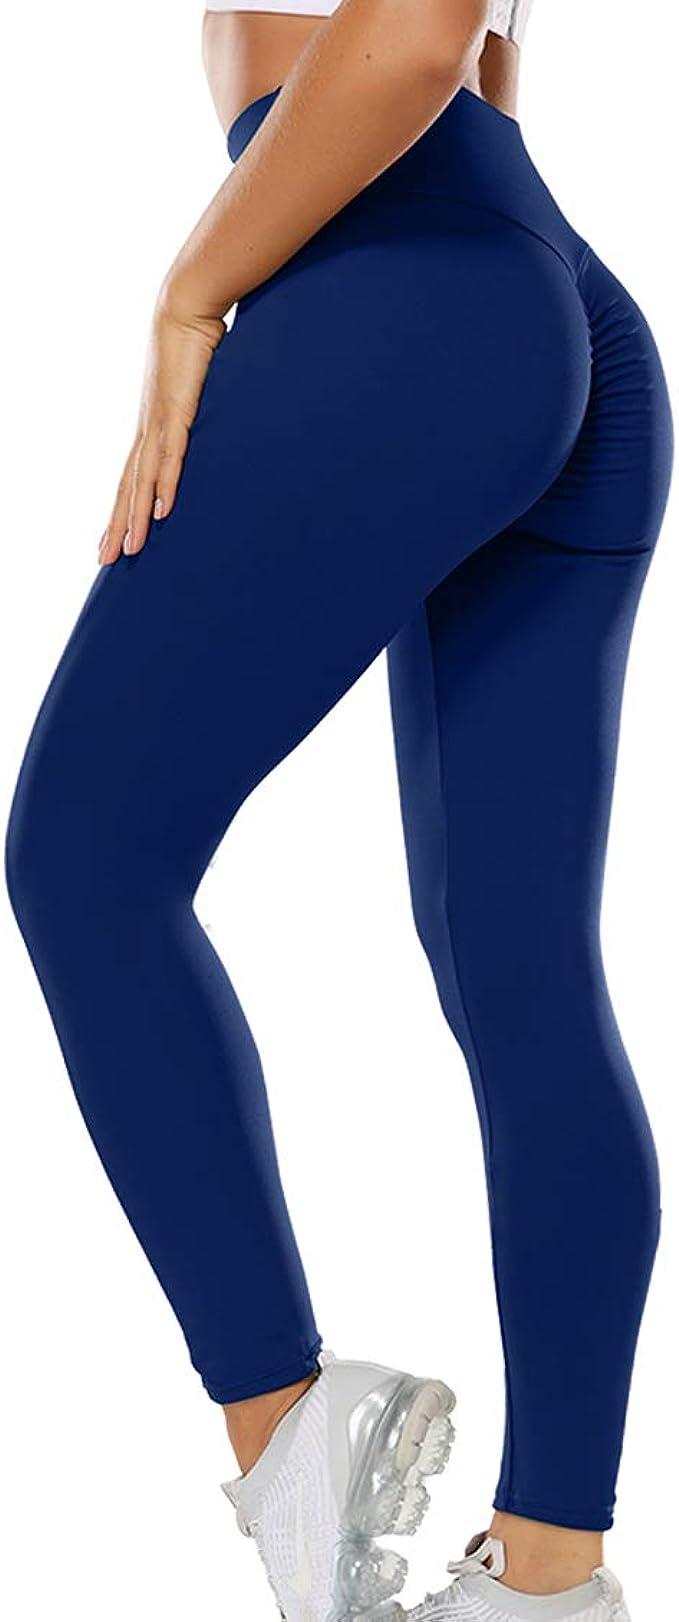 KIWI RATA Leggings Fitness Donna Sportivi Leggins Vita Alta Senza Cuciture Opaco Pantaloni Elastici Par Yoga Palestra Allenamento